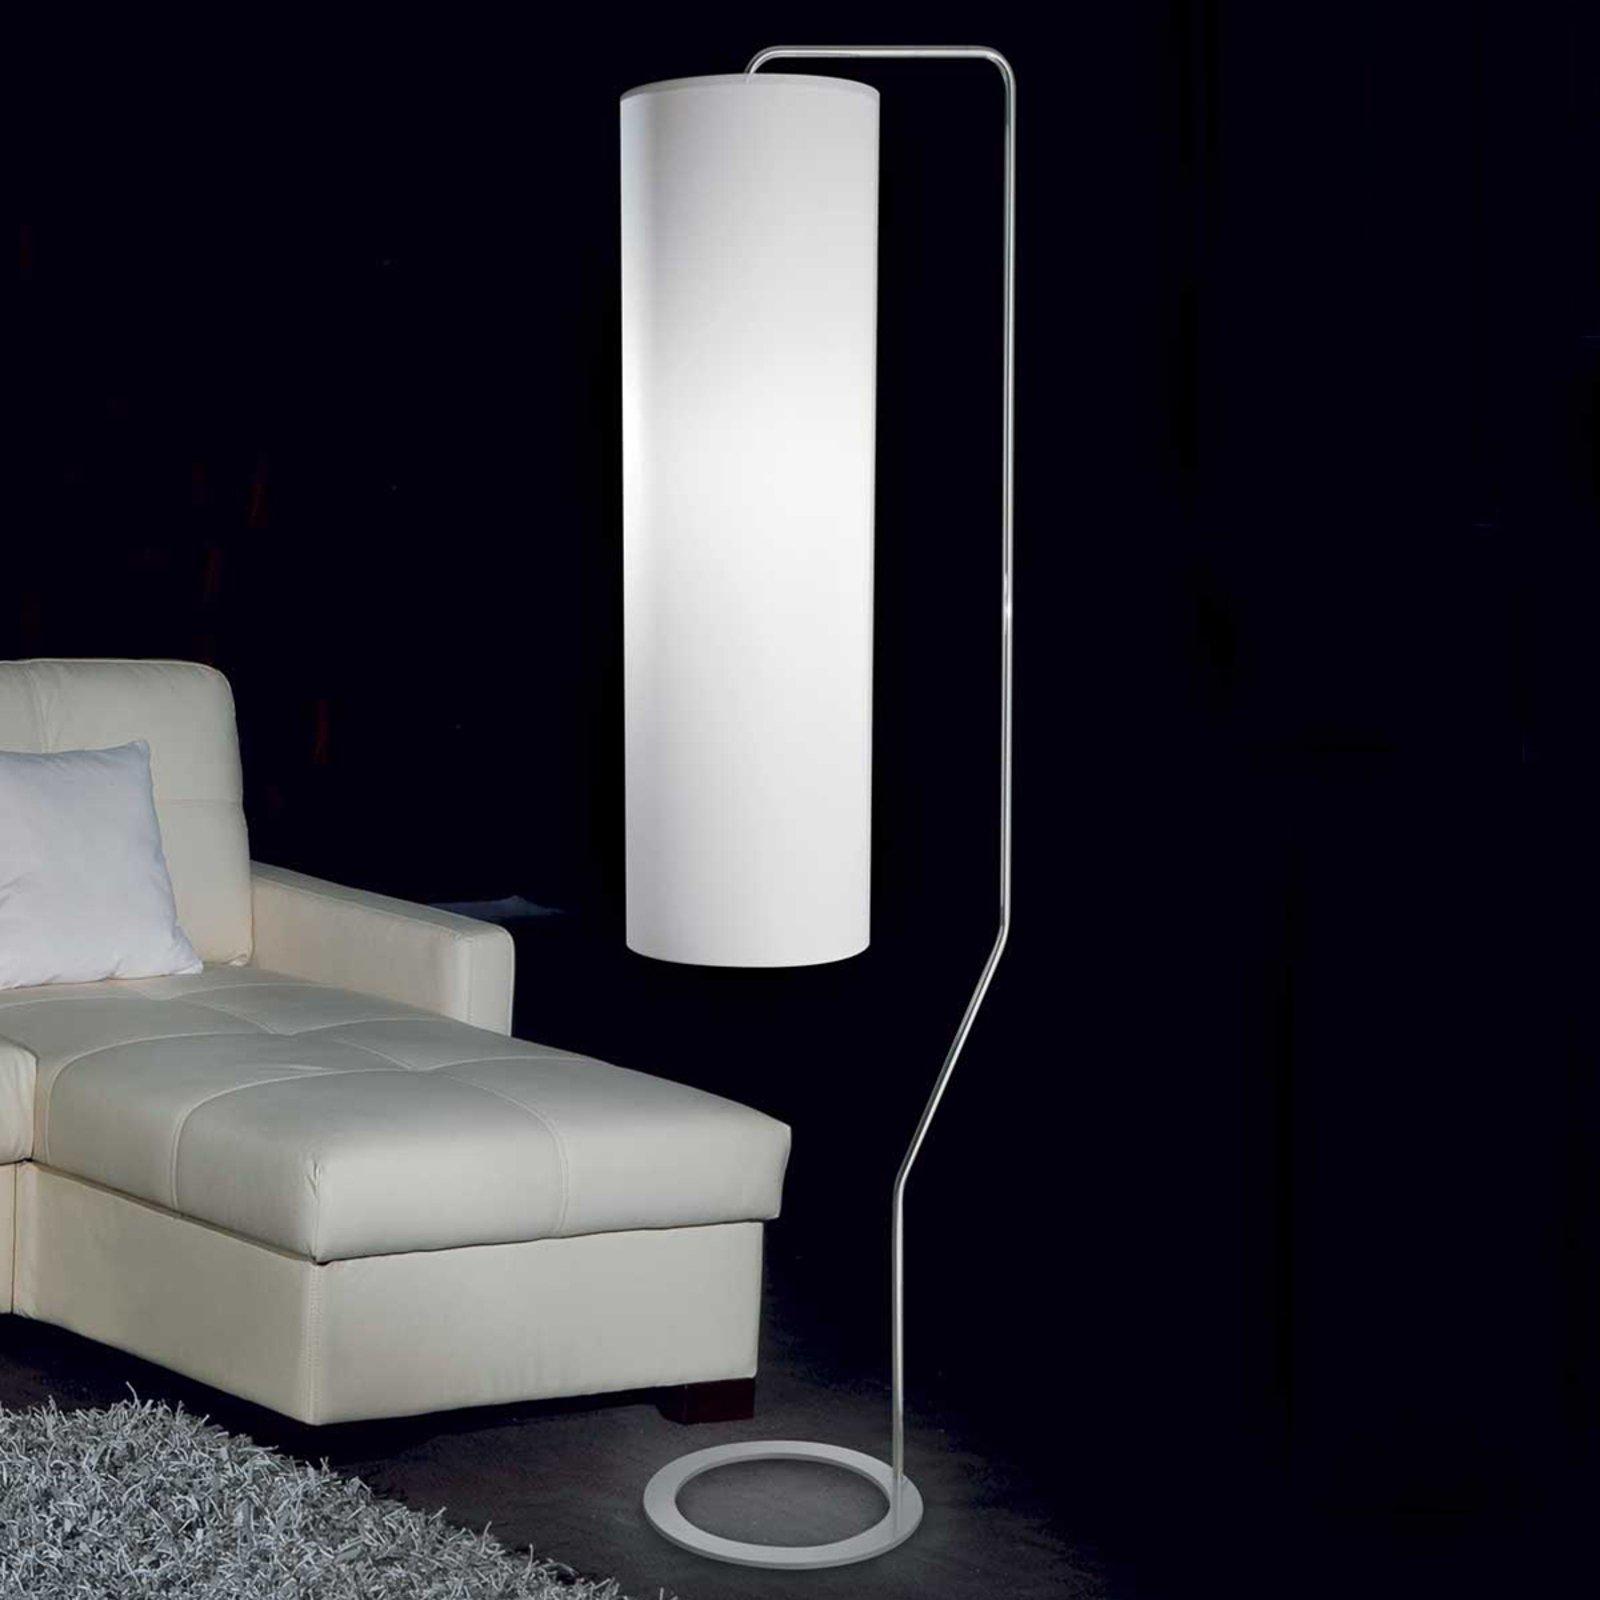 Moteriktig stålampe Trendy